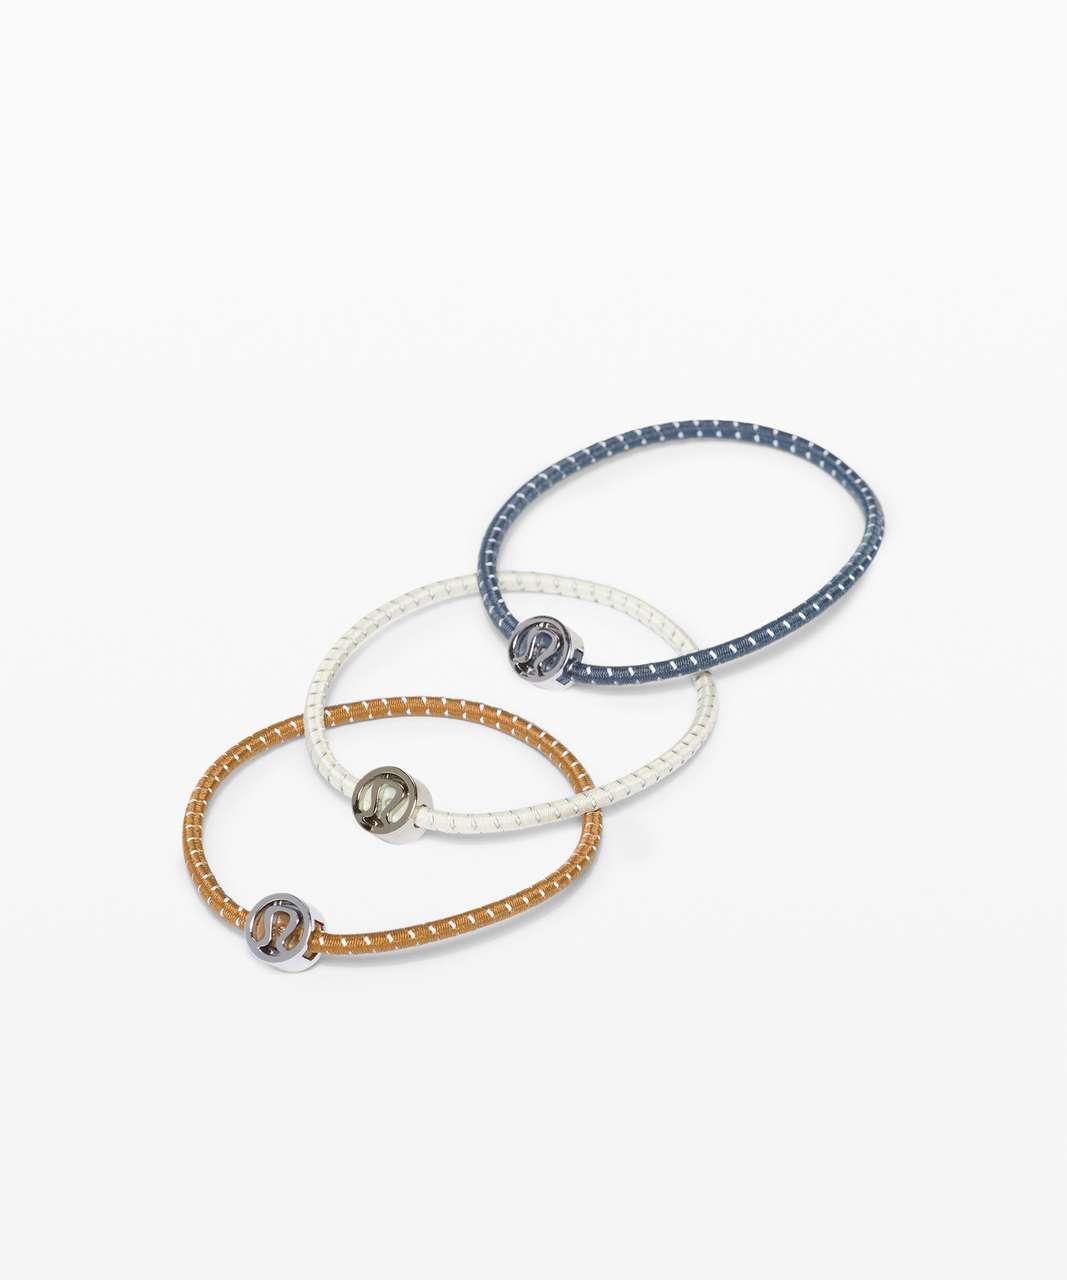 Lululemon Glow On Hair Ties - Iron Blue / Spiced Bronze / Antique White